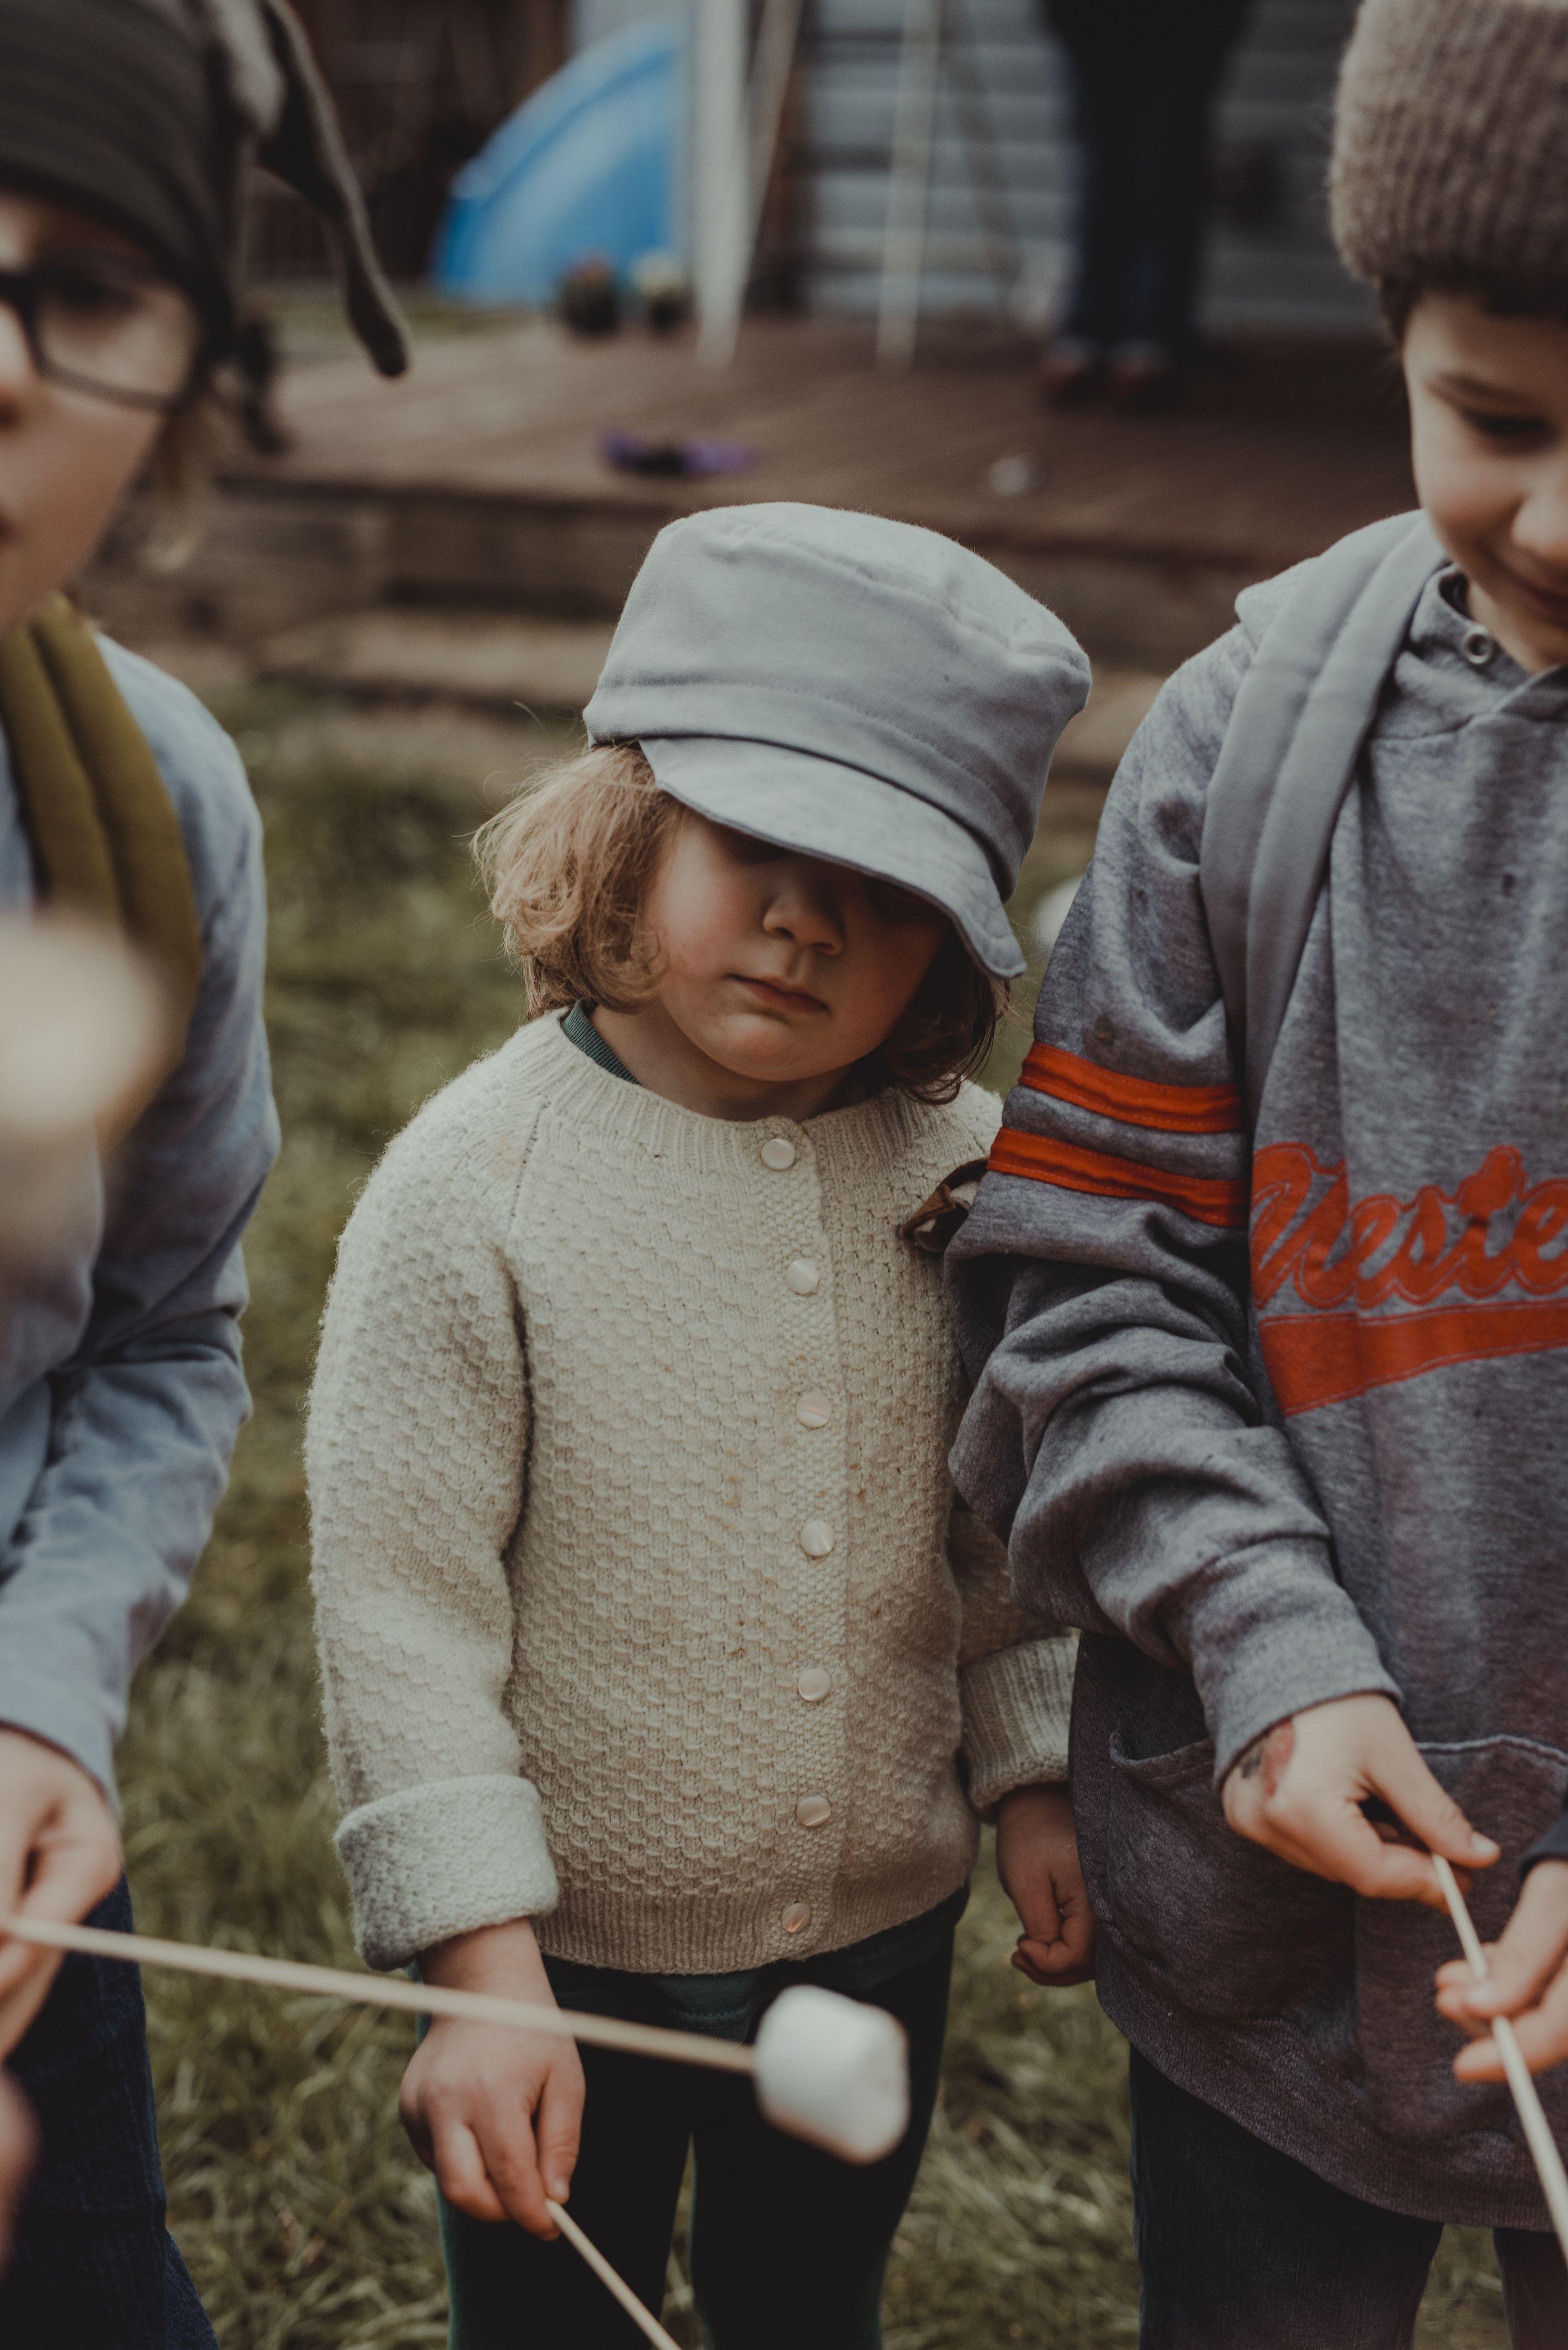 Cascade handmade adventure cap etsy listing girl in